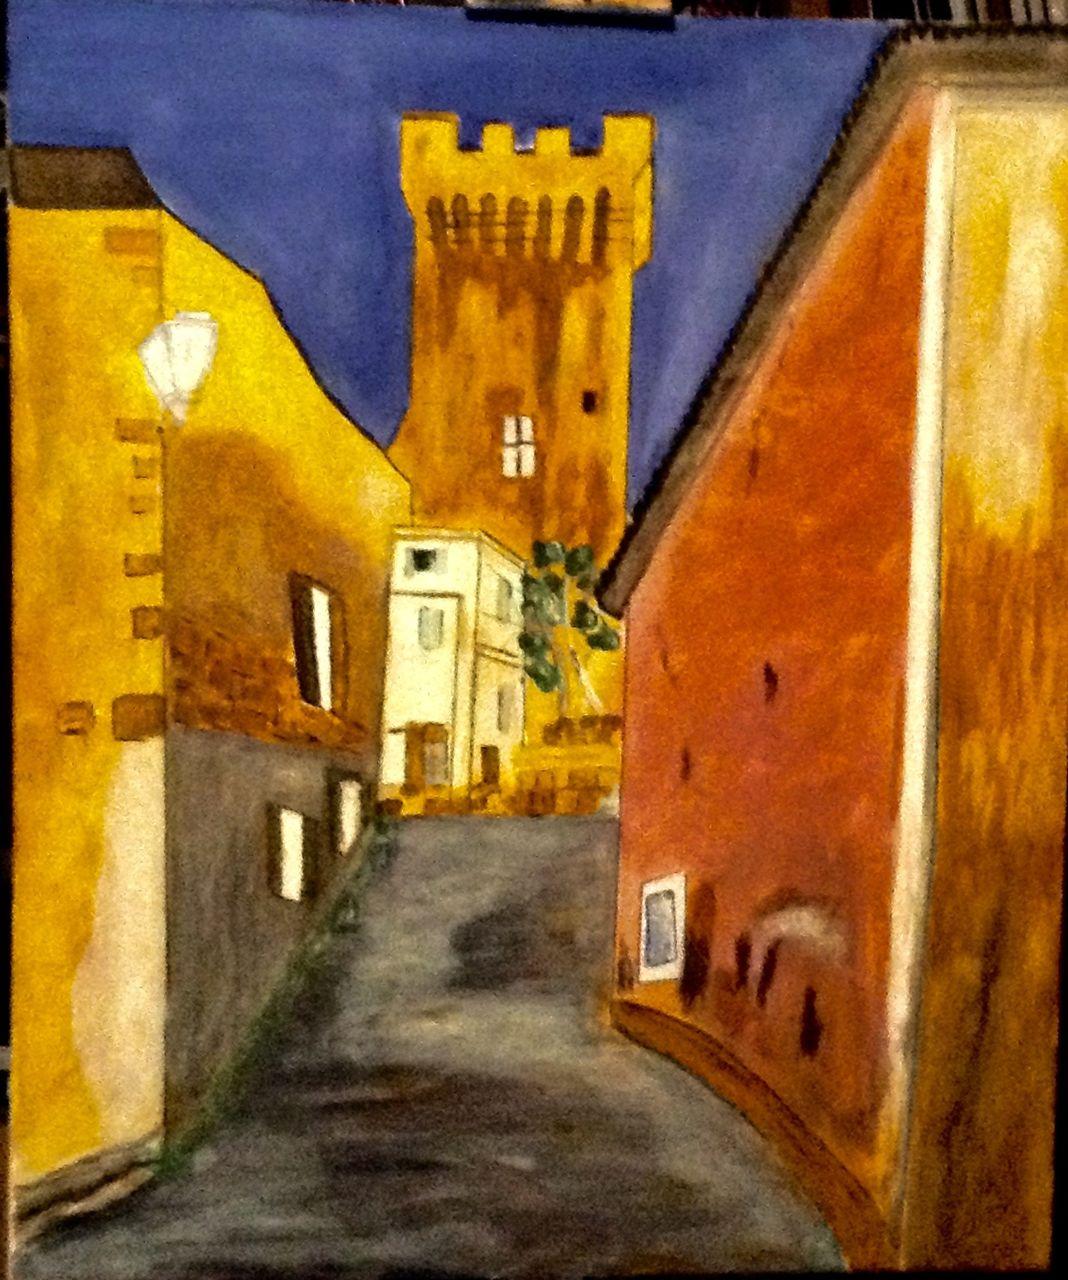 Mobel Frankreich Malerei : Bild acrylmalerei bretagne frankreich malerei von